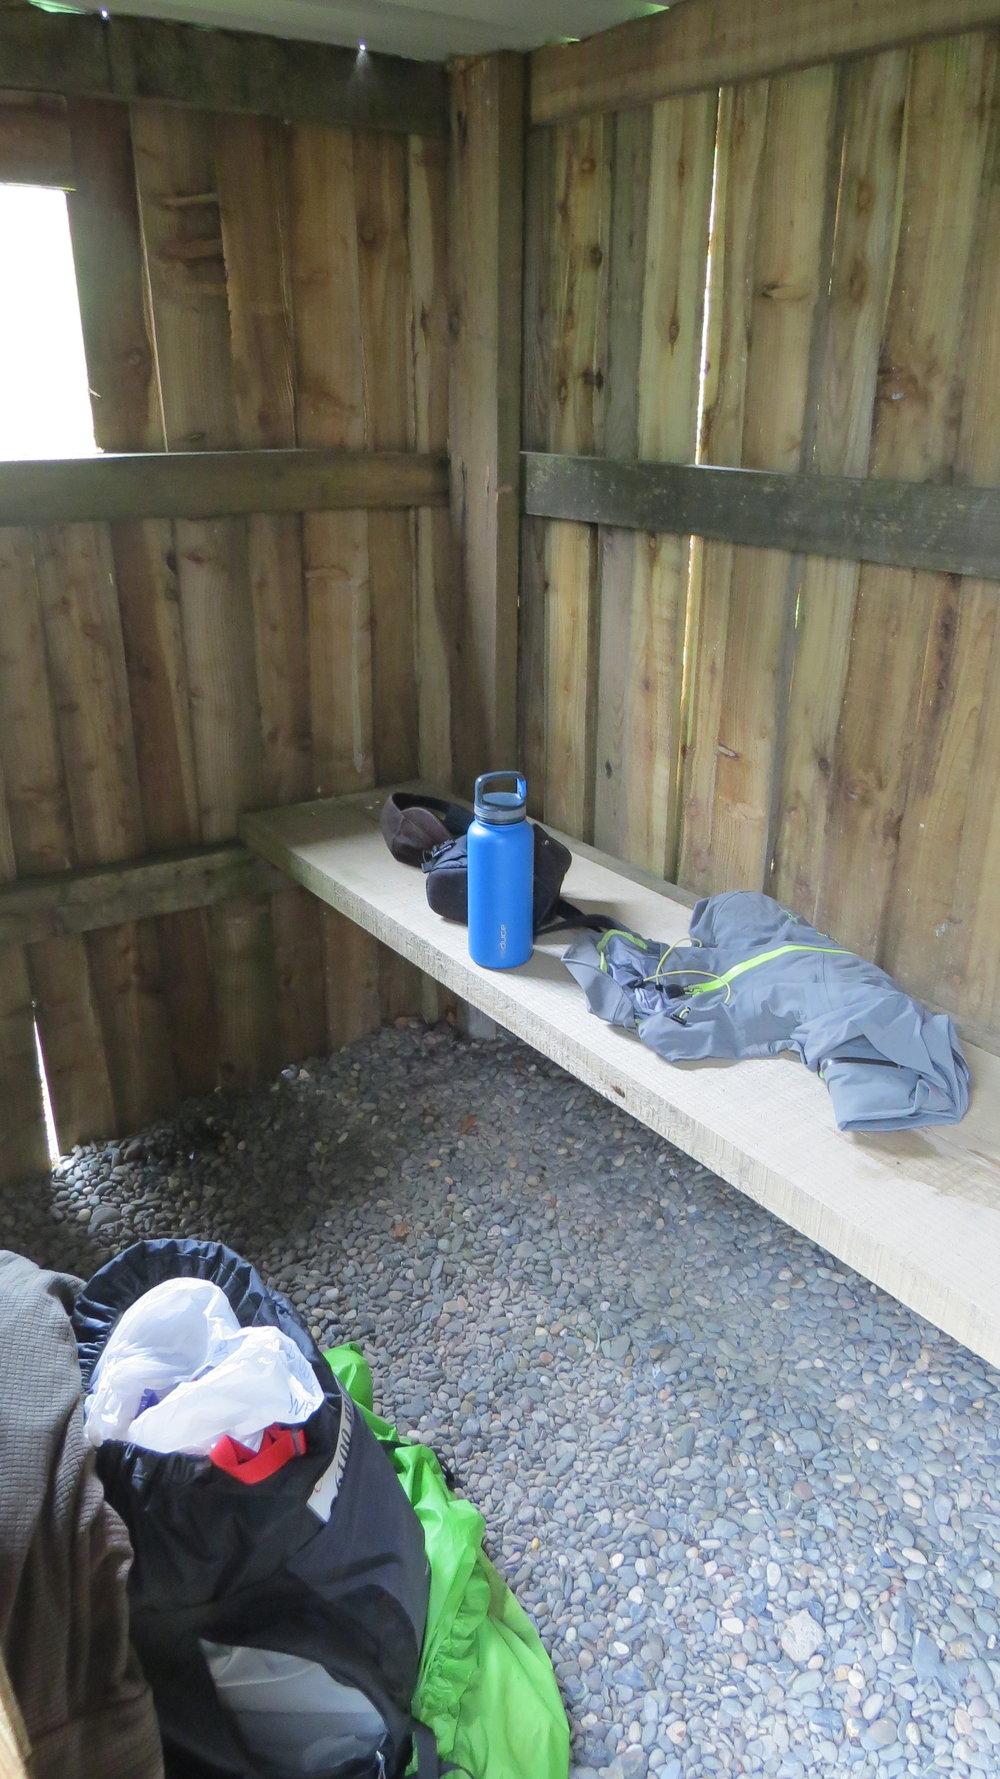 Bus (or Rain) Shelter